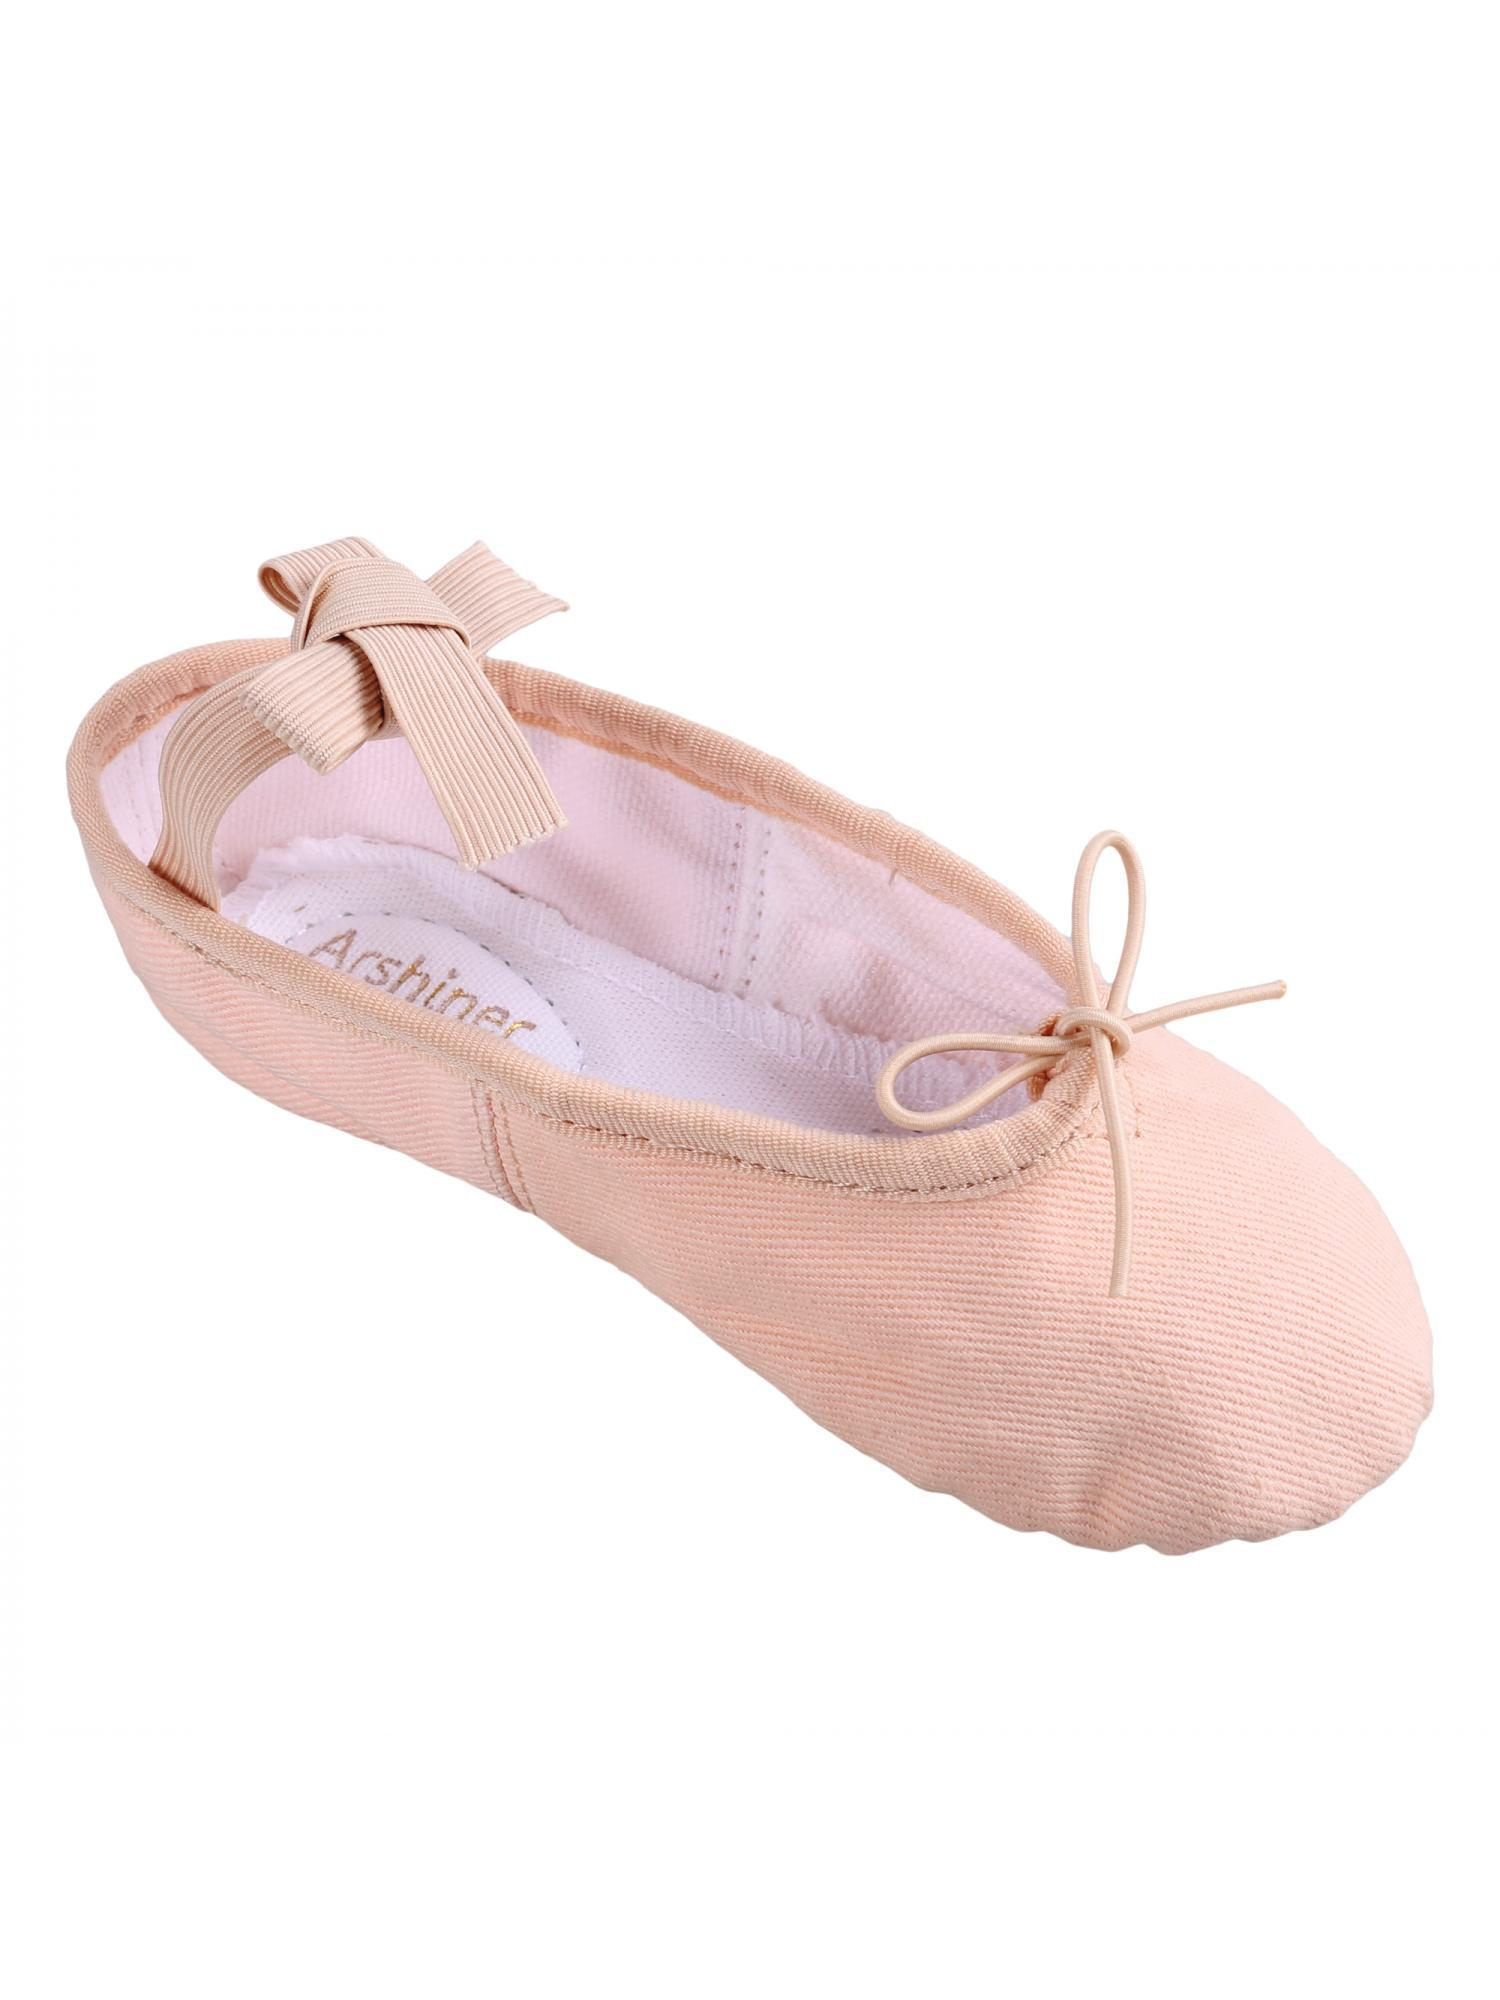 Cleanerlove  Ballet Slipper Shoes Pointe Split Sole Practice Ballet Dancing Gymnastics Shoes Ballet Flat Slipper Yoga Shoes CEAER